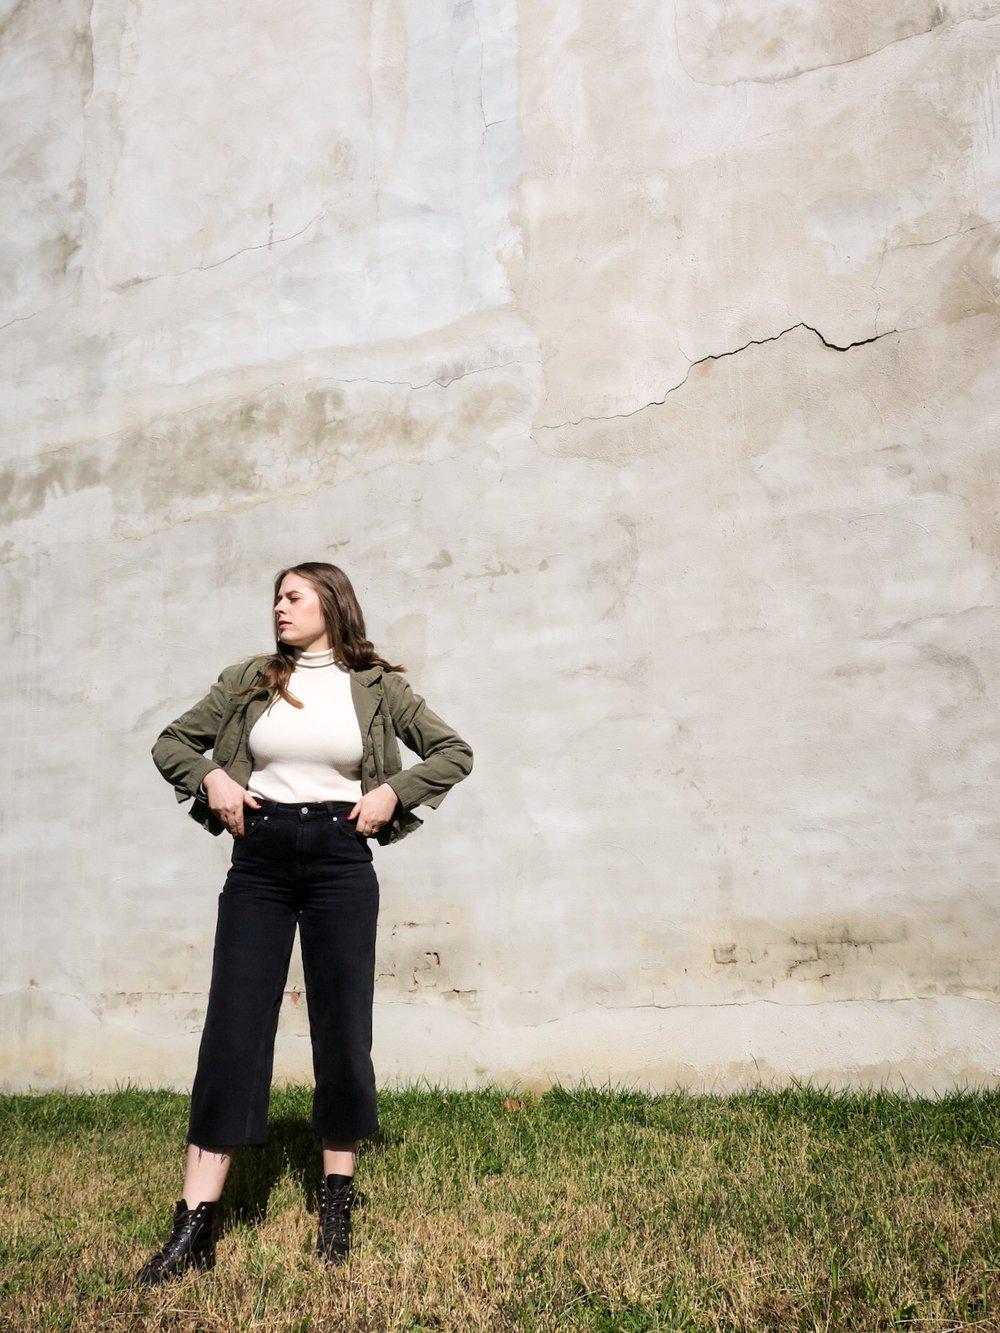 blogger fashion by day lacausa.JPEG